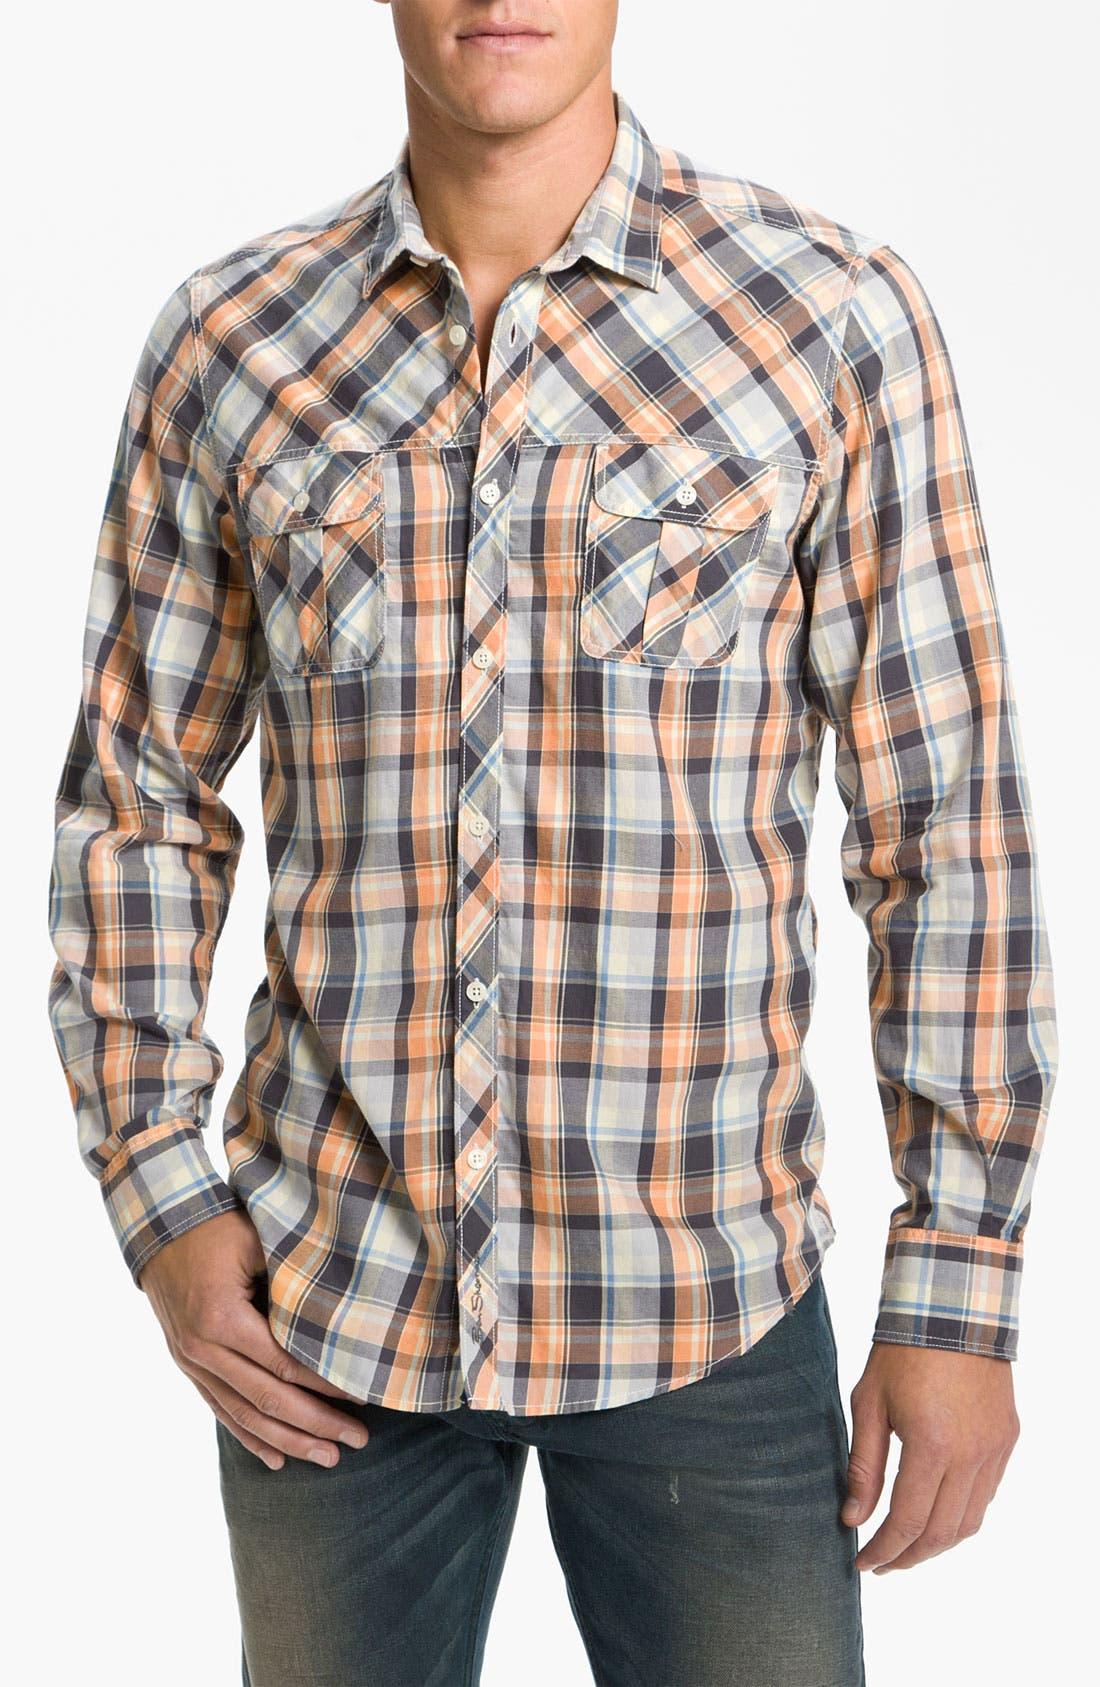 Alternate Image 1 Selected - Ben Sherman Plaid Woven Shirt